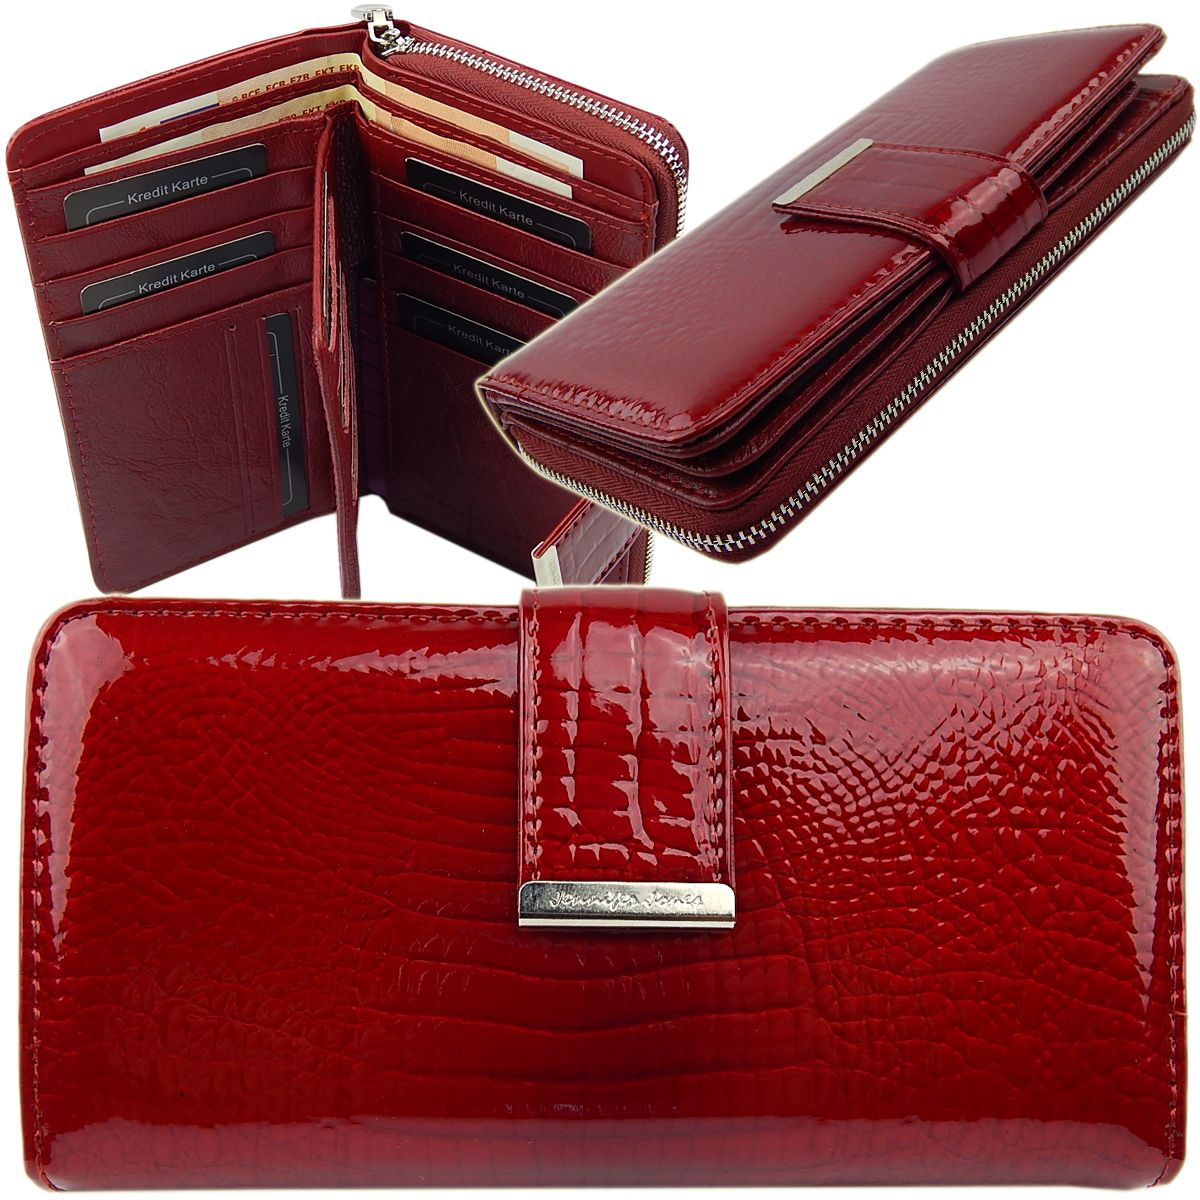 OPJ712R Geldbörse Leder rot Portemonnaie Querformat Croco. Jennifer Jones